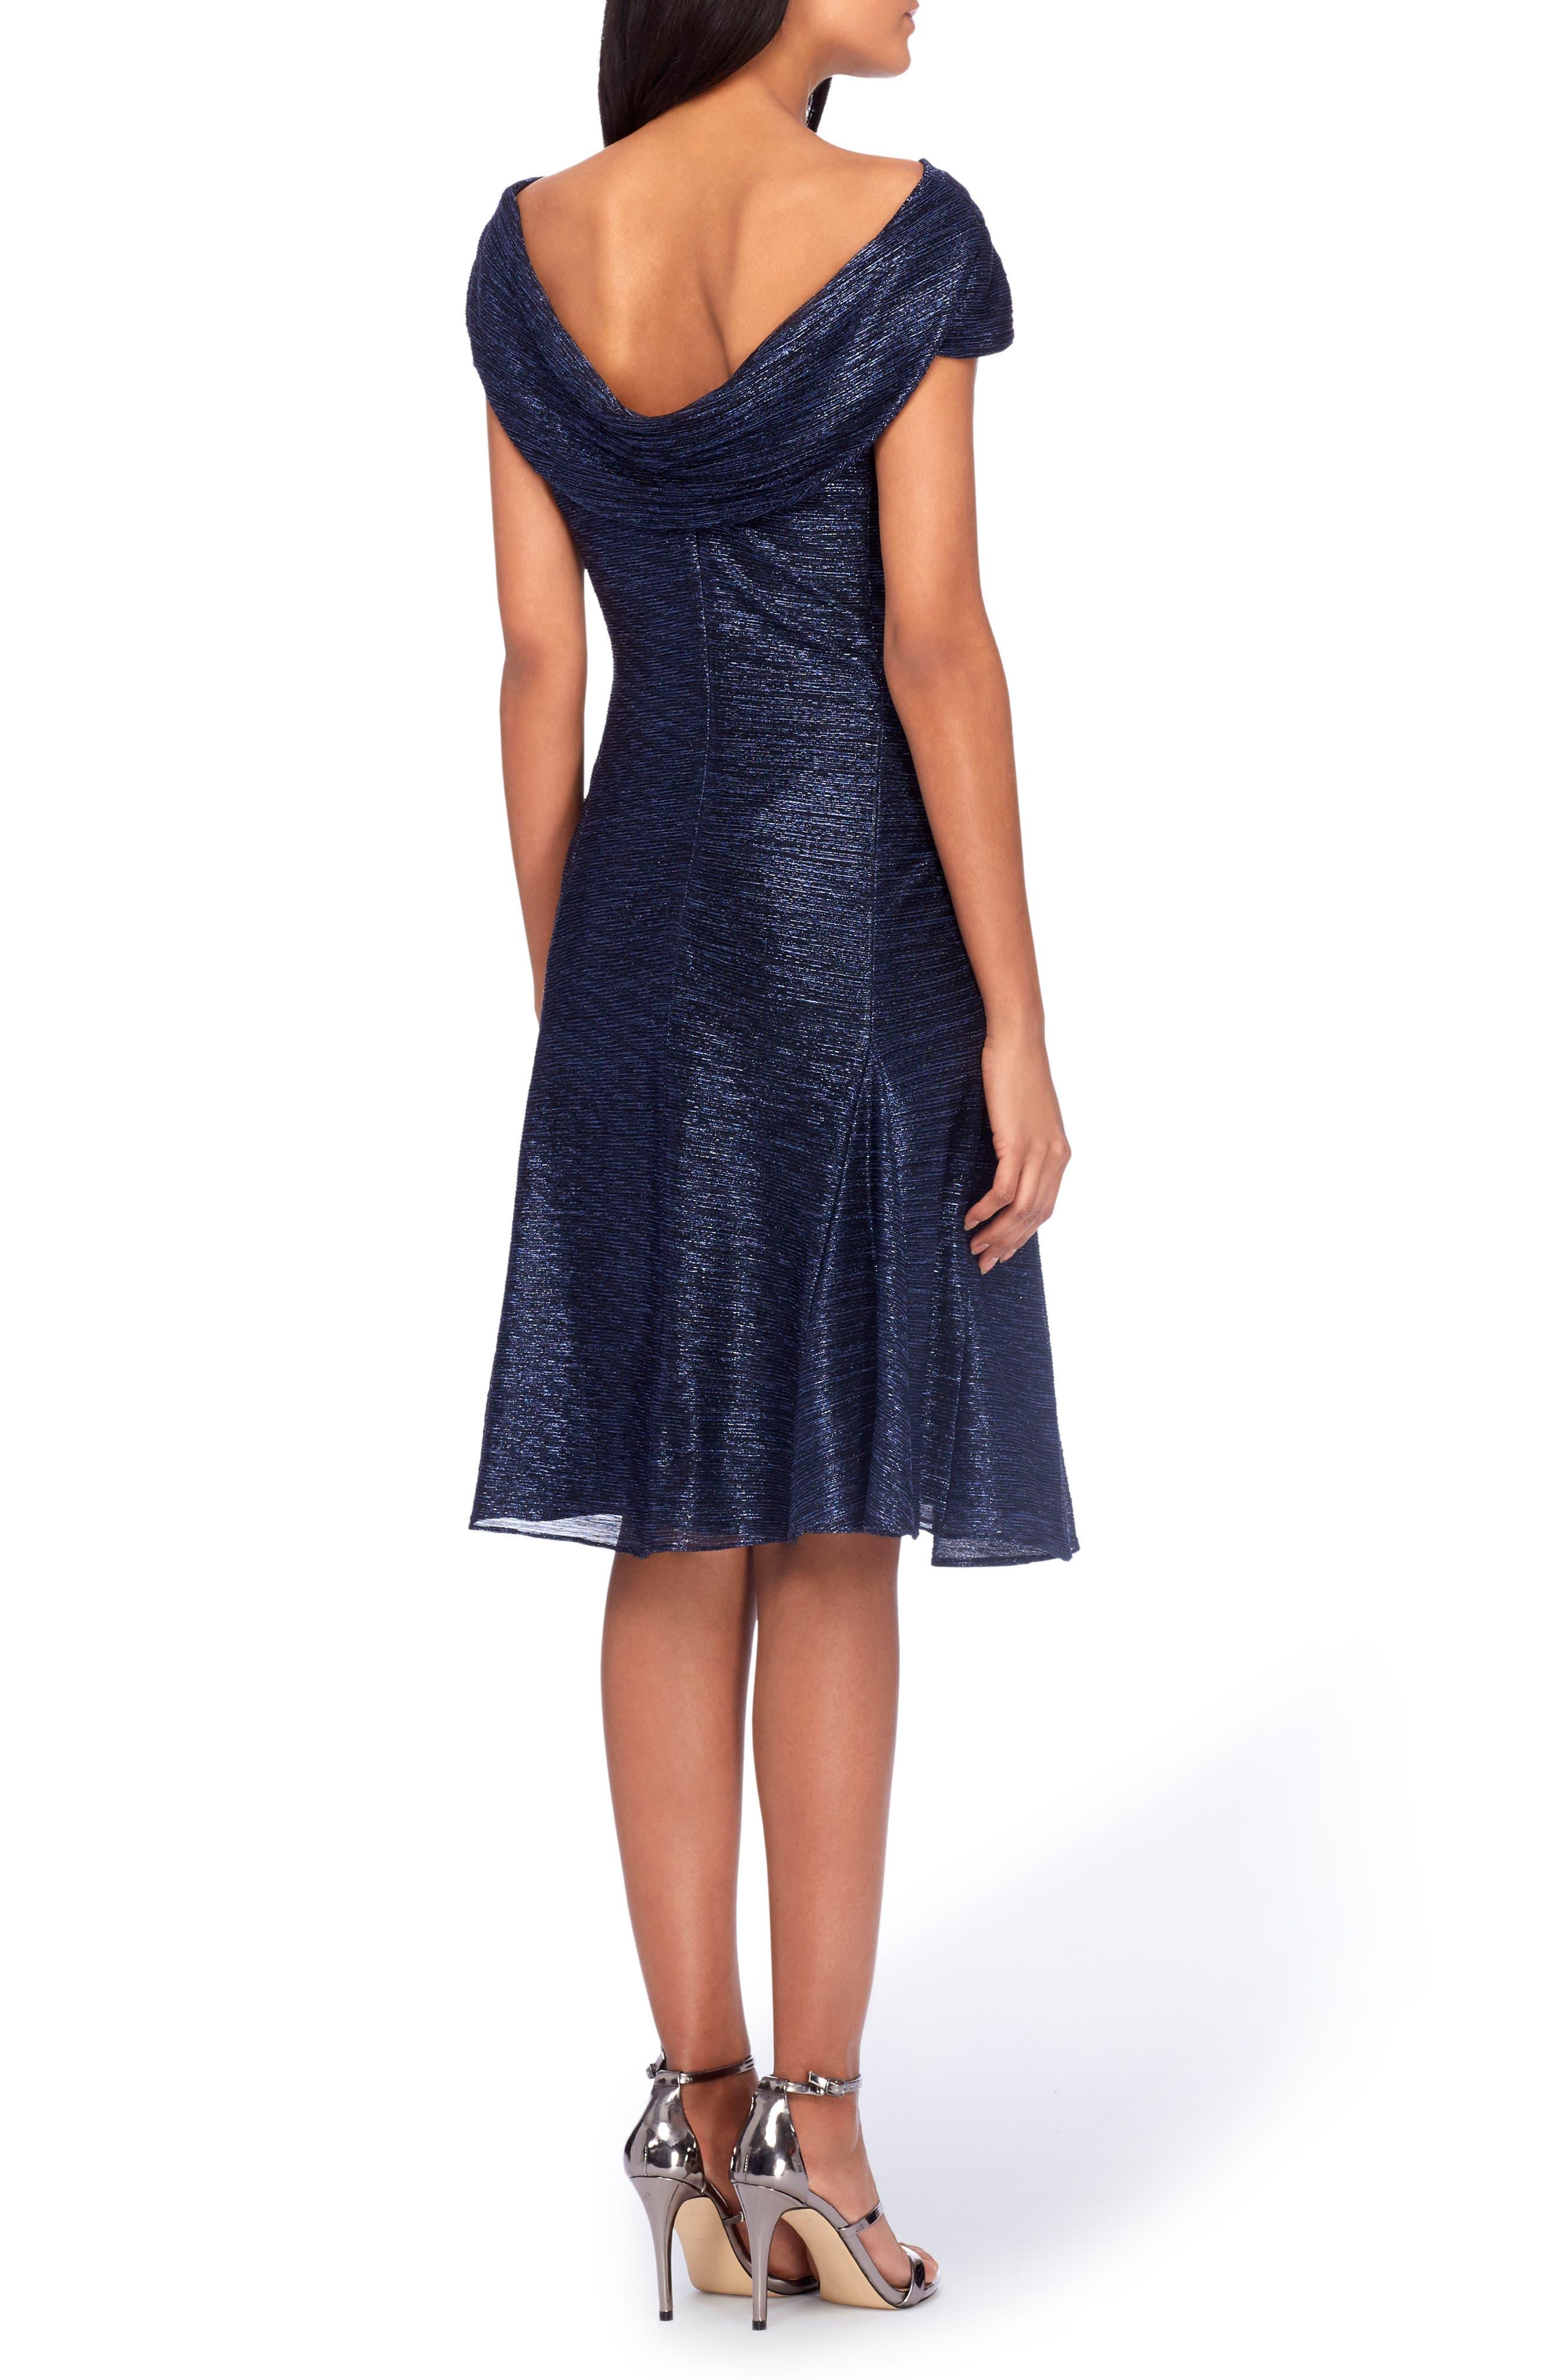 TAHARI,                             Cowl Neck Fit & Flare Dress,                             Alternate thumbnail 2, color,                             412